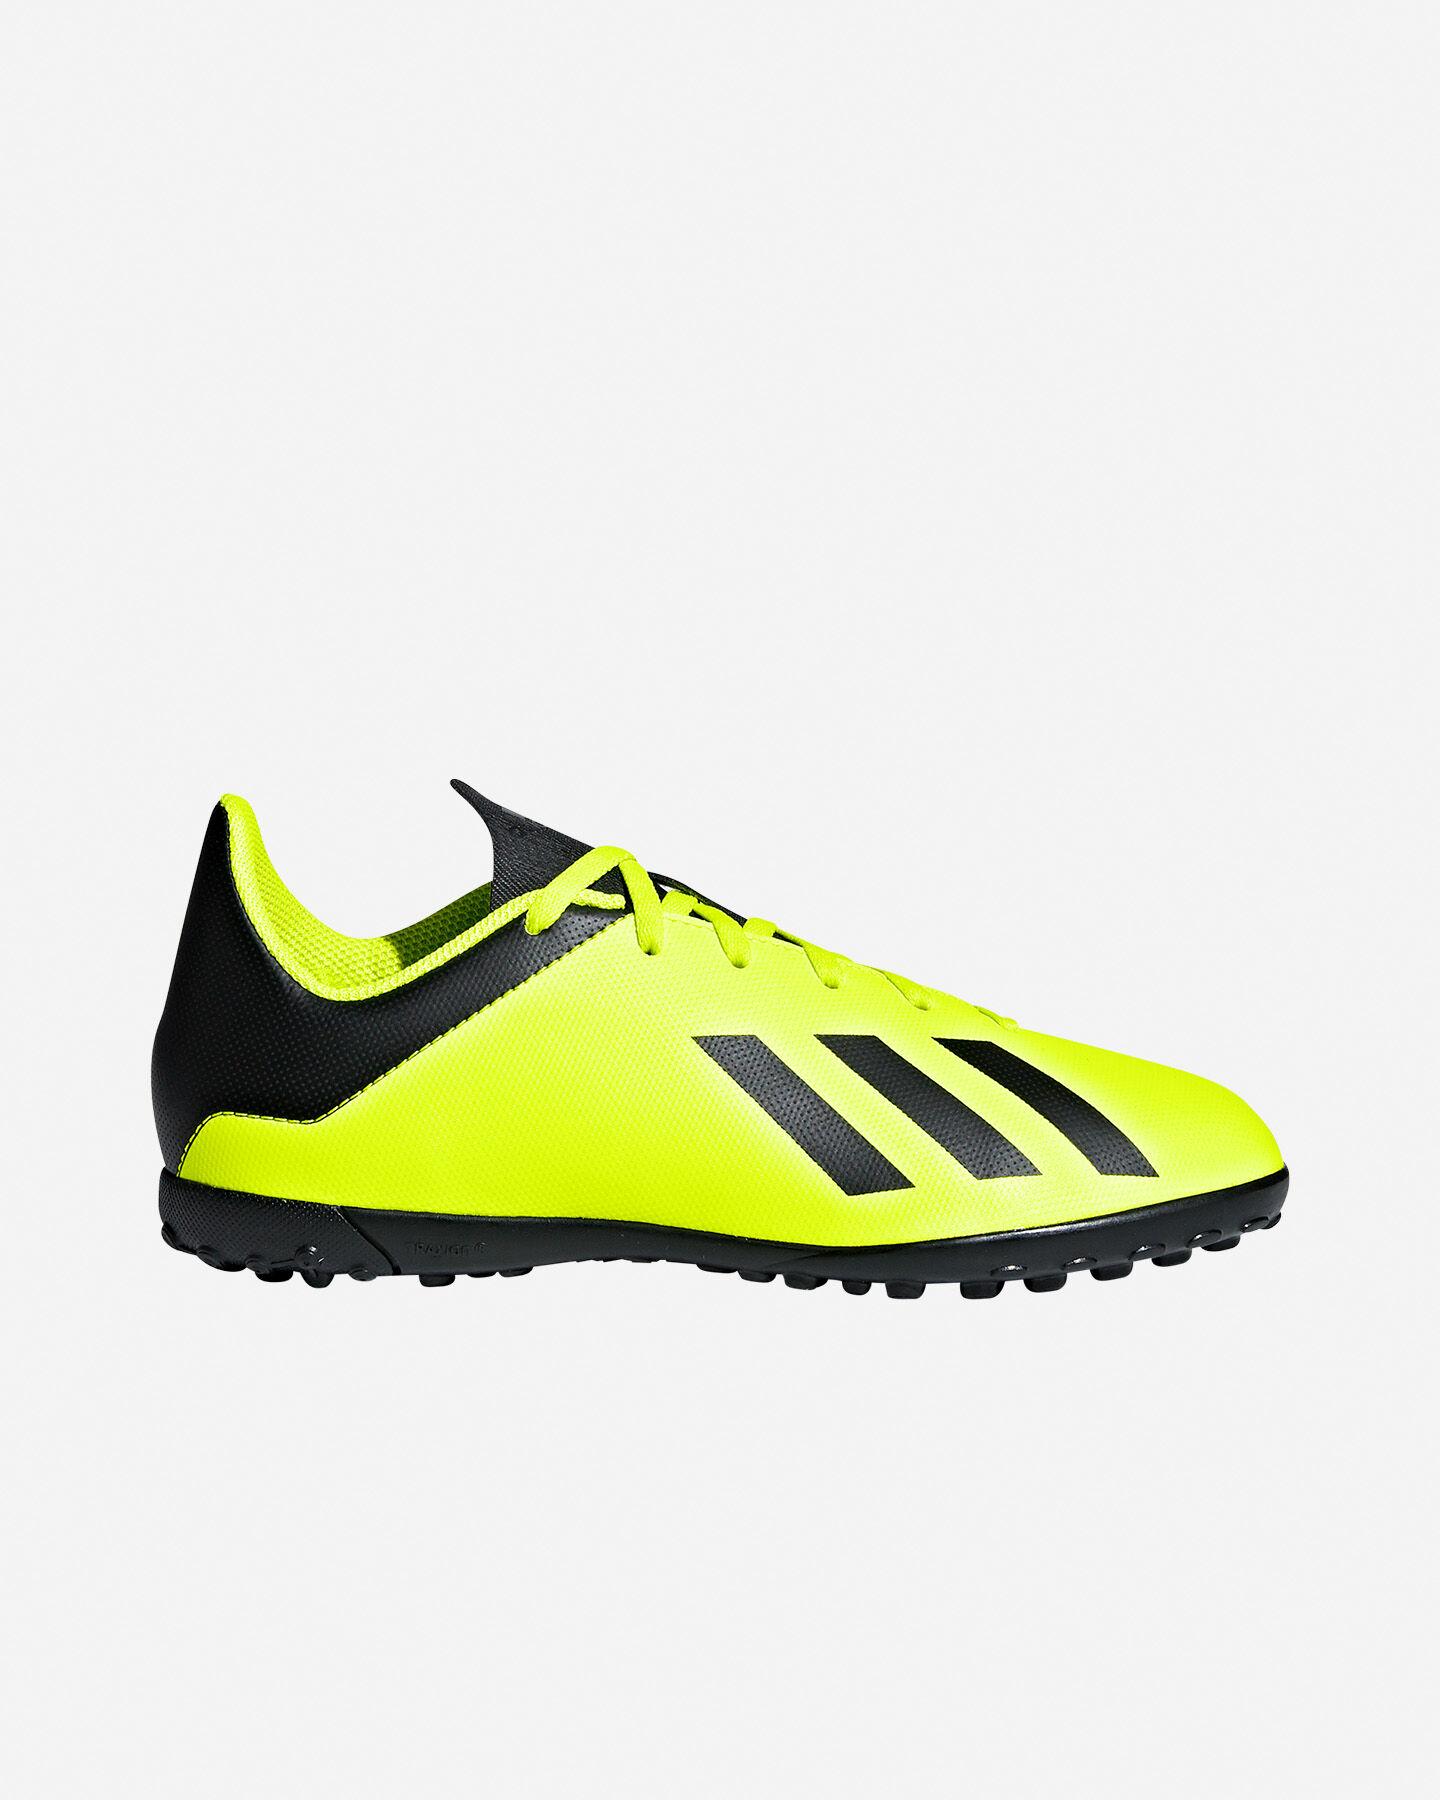 scarpe calcio adidas bambino sintetico